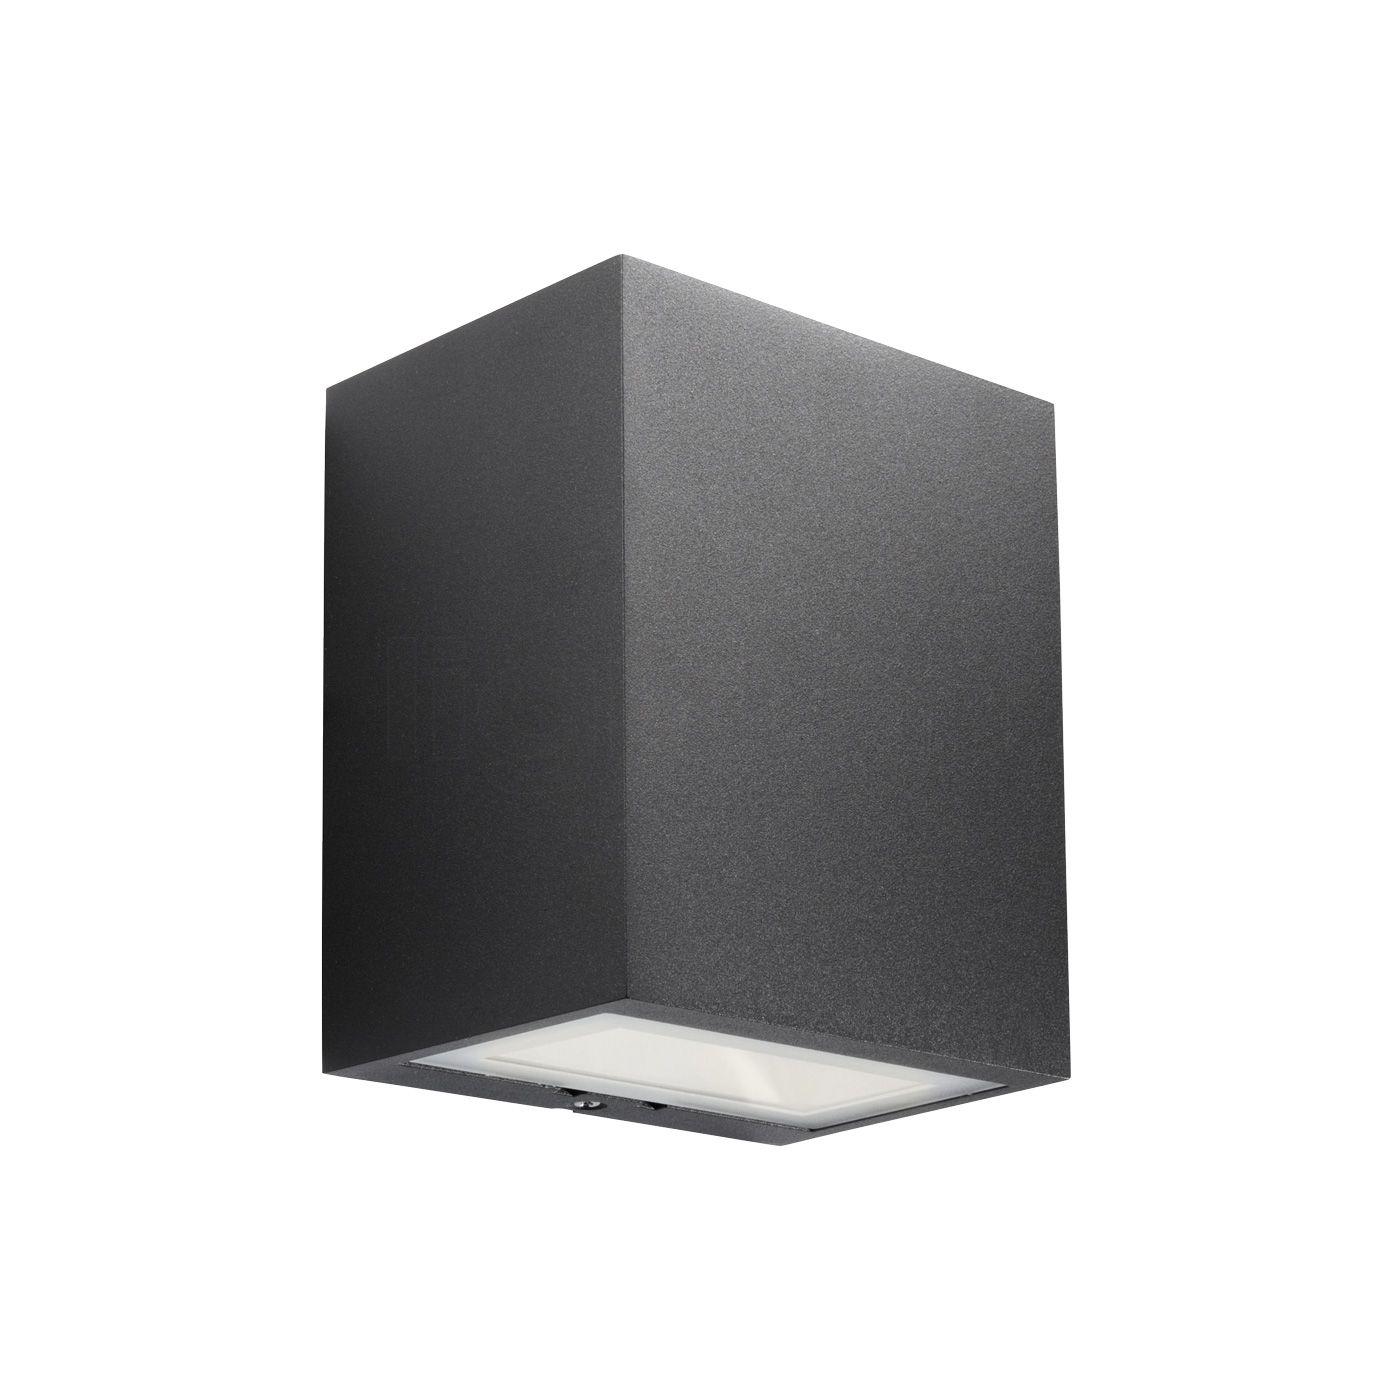 Bougie led castorama amazing interesting free luminaire for Spot encastrable exterieur brico depot